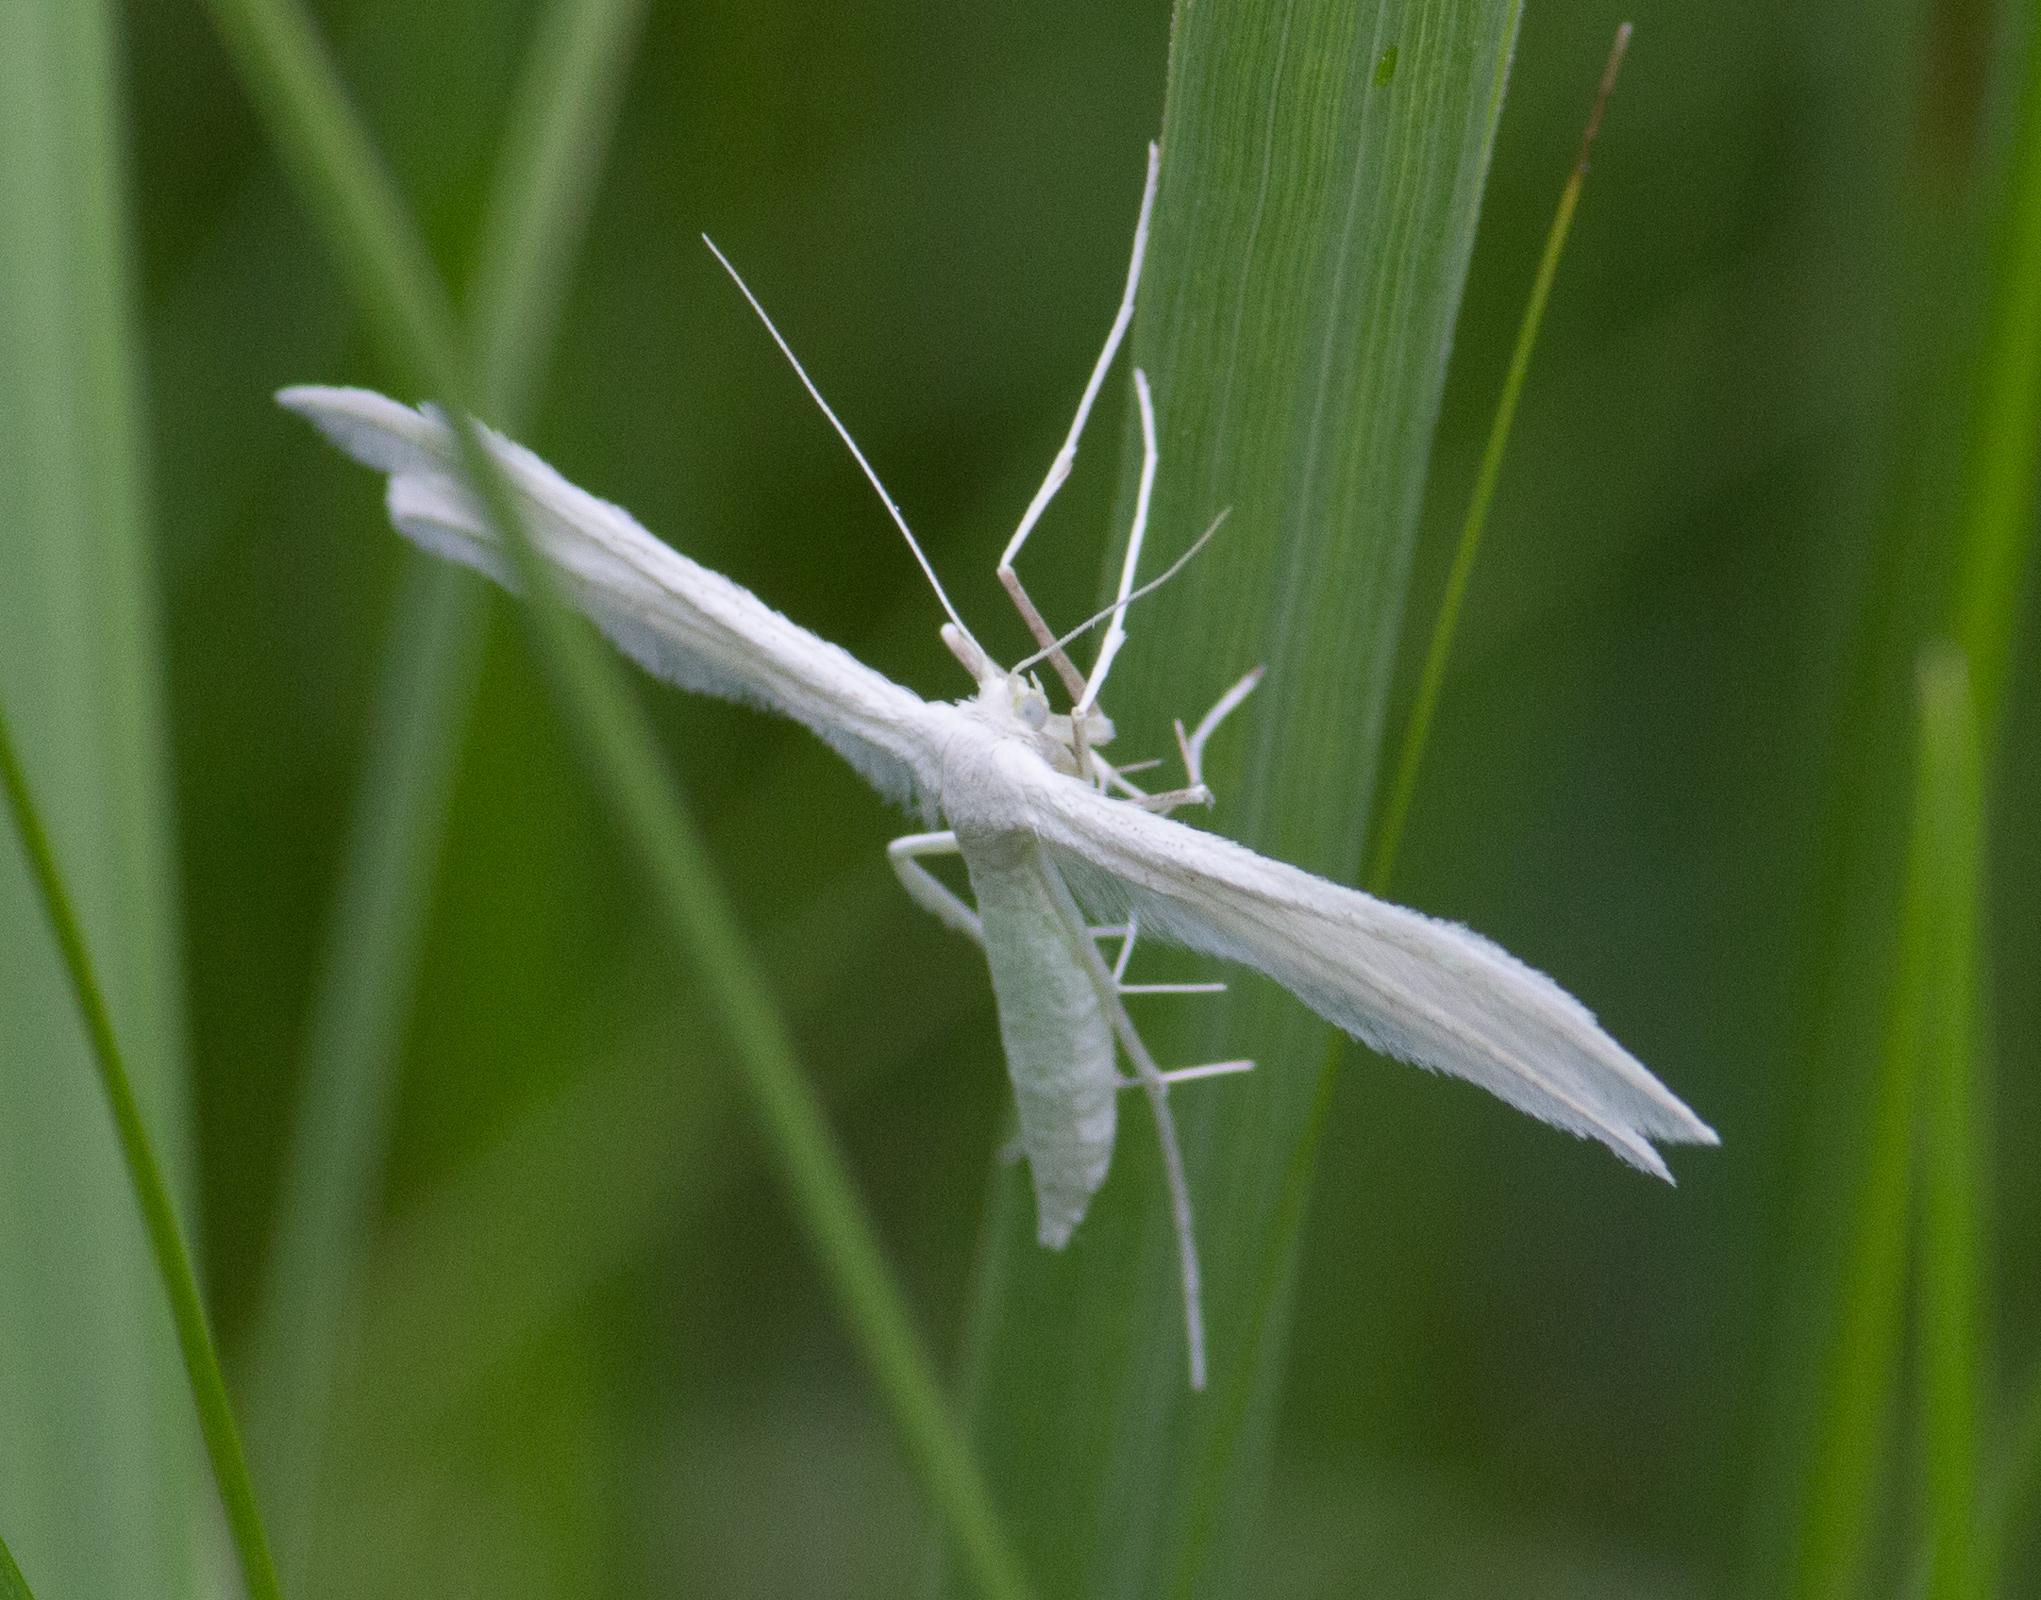 Image of White Plume